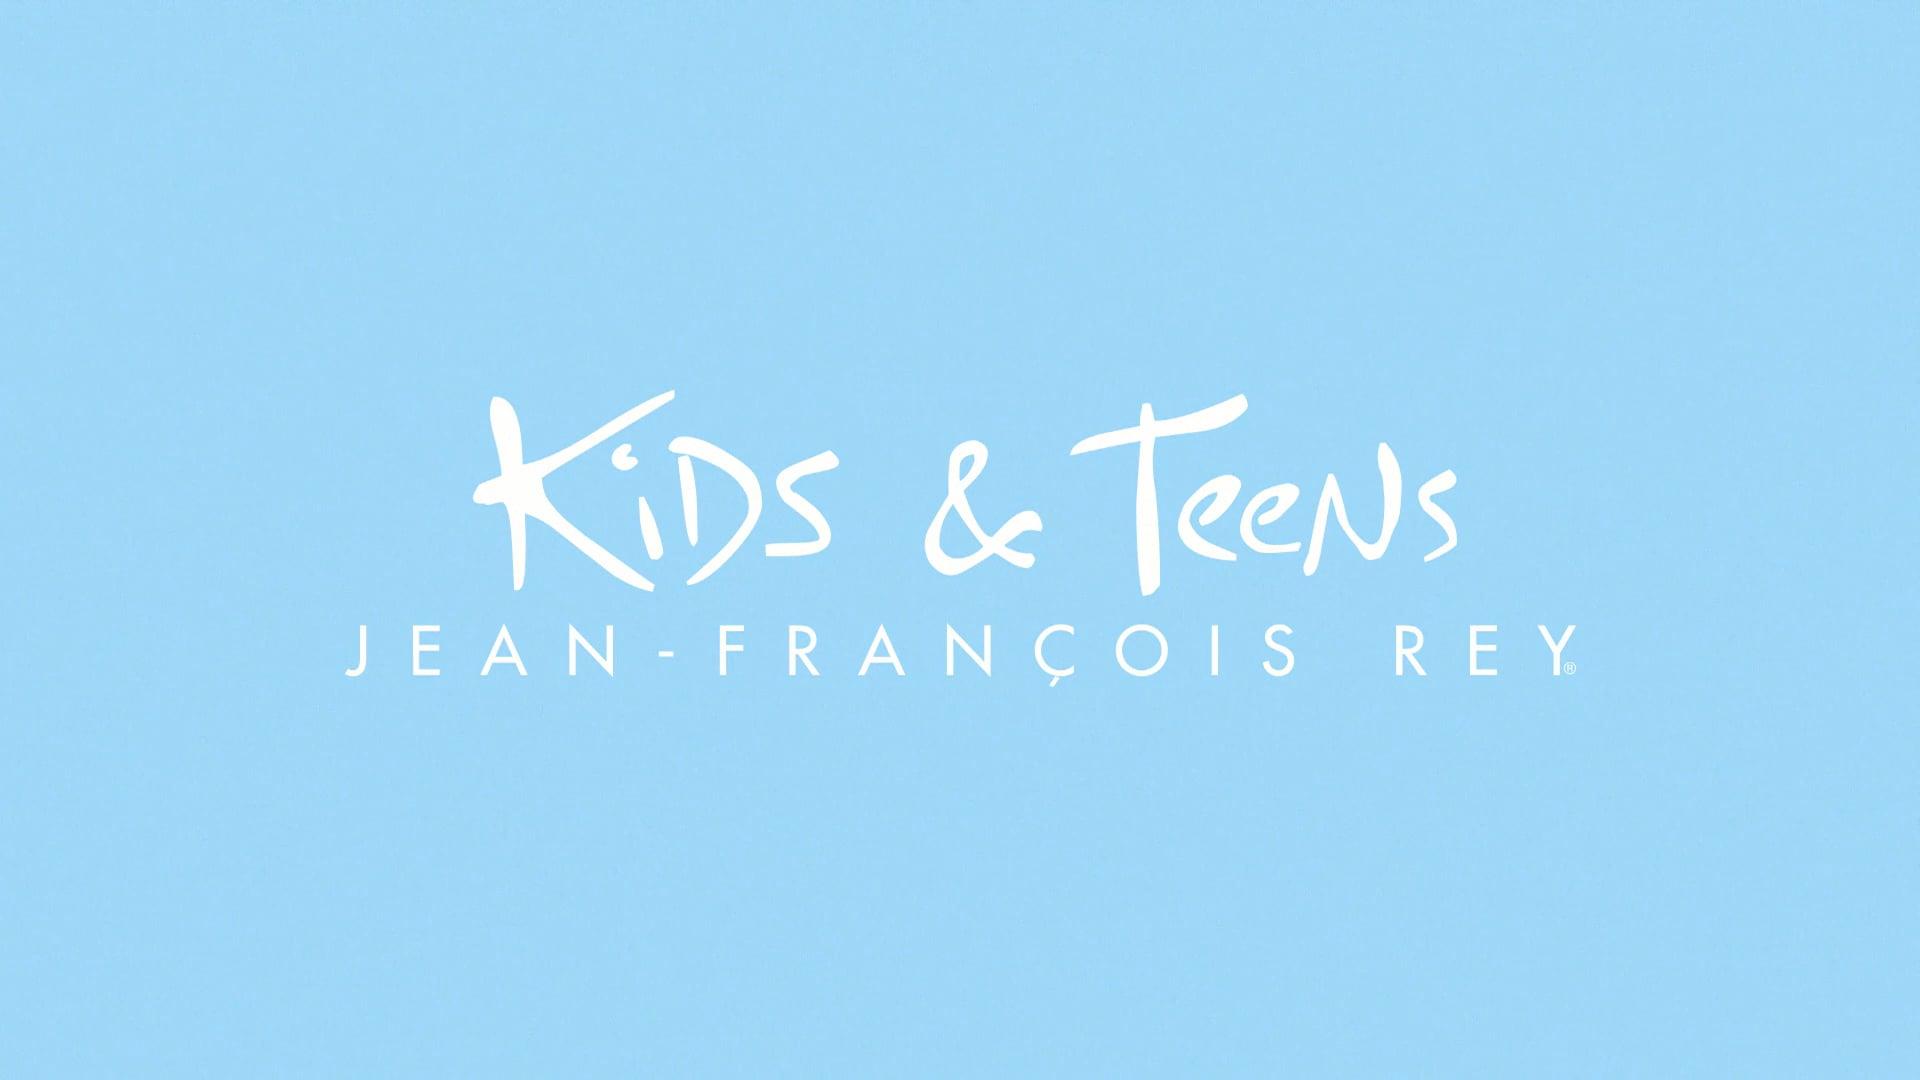 Kids & teen - JF REY